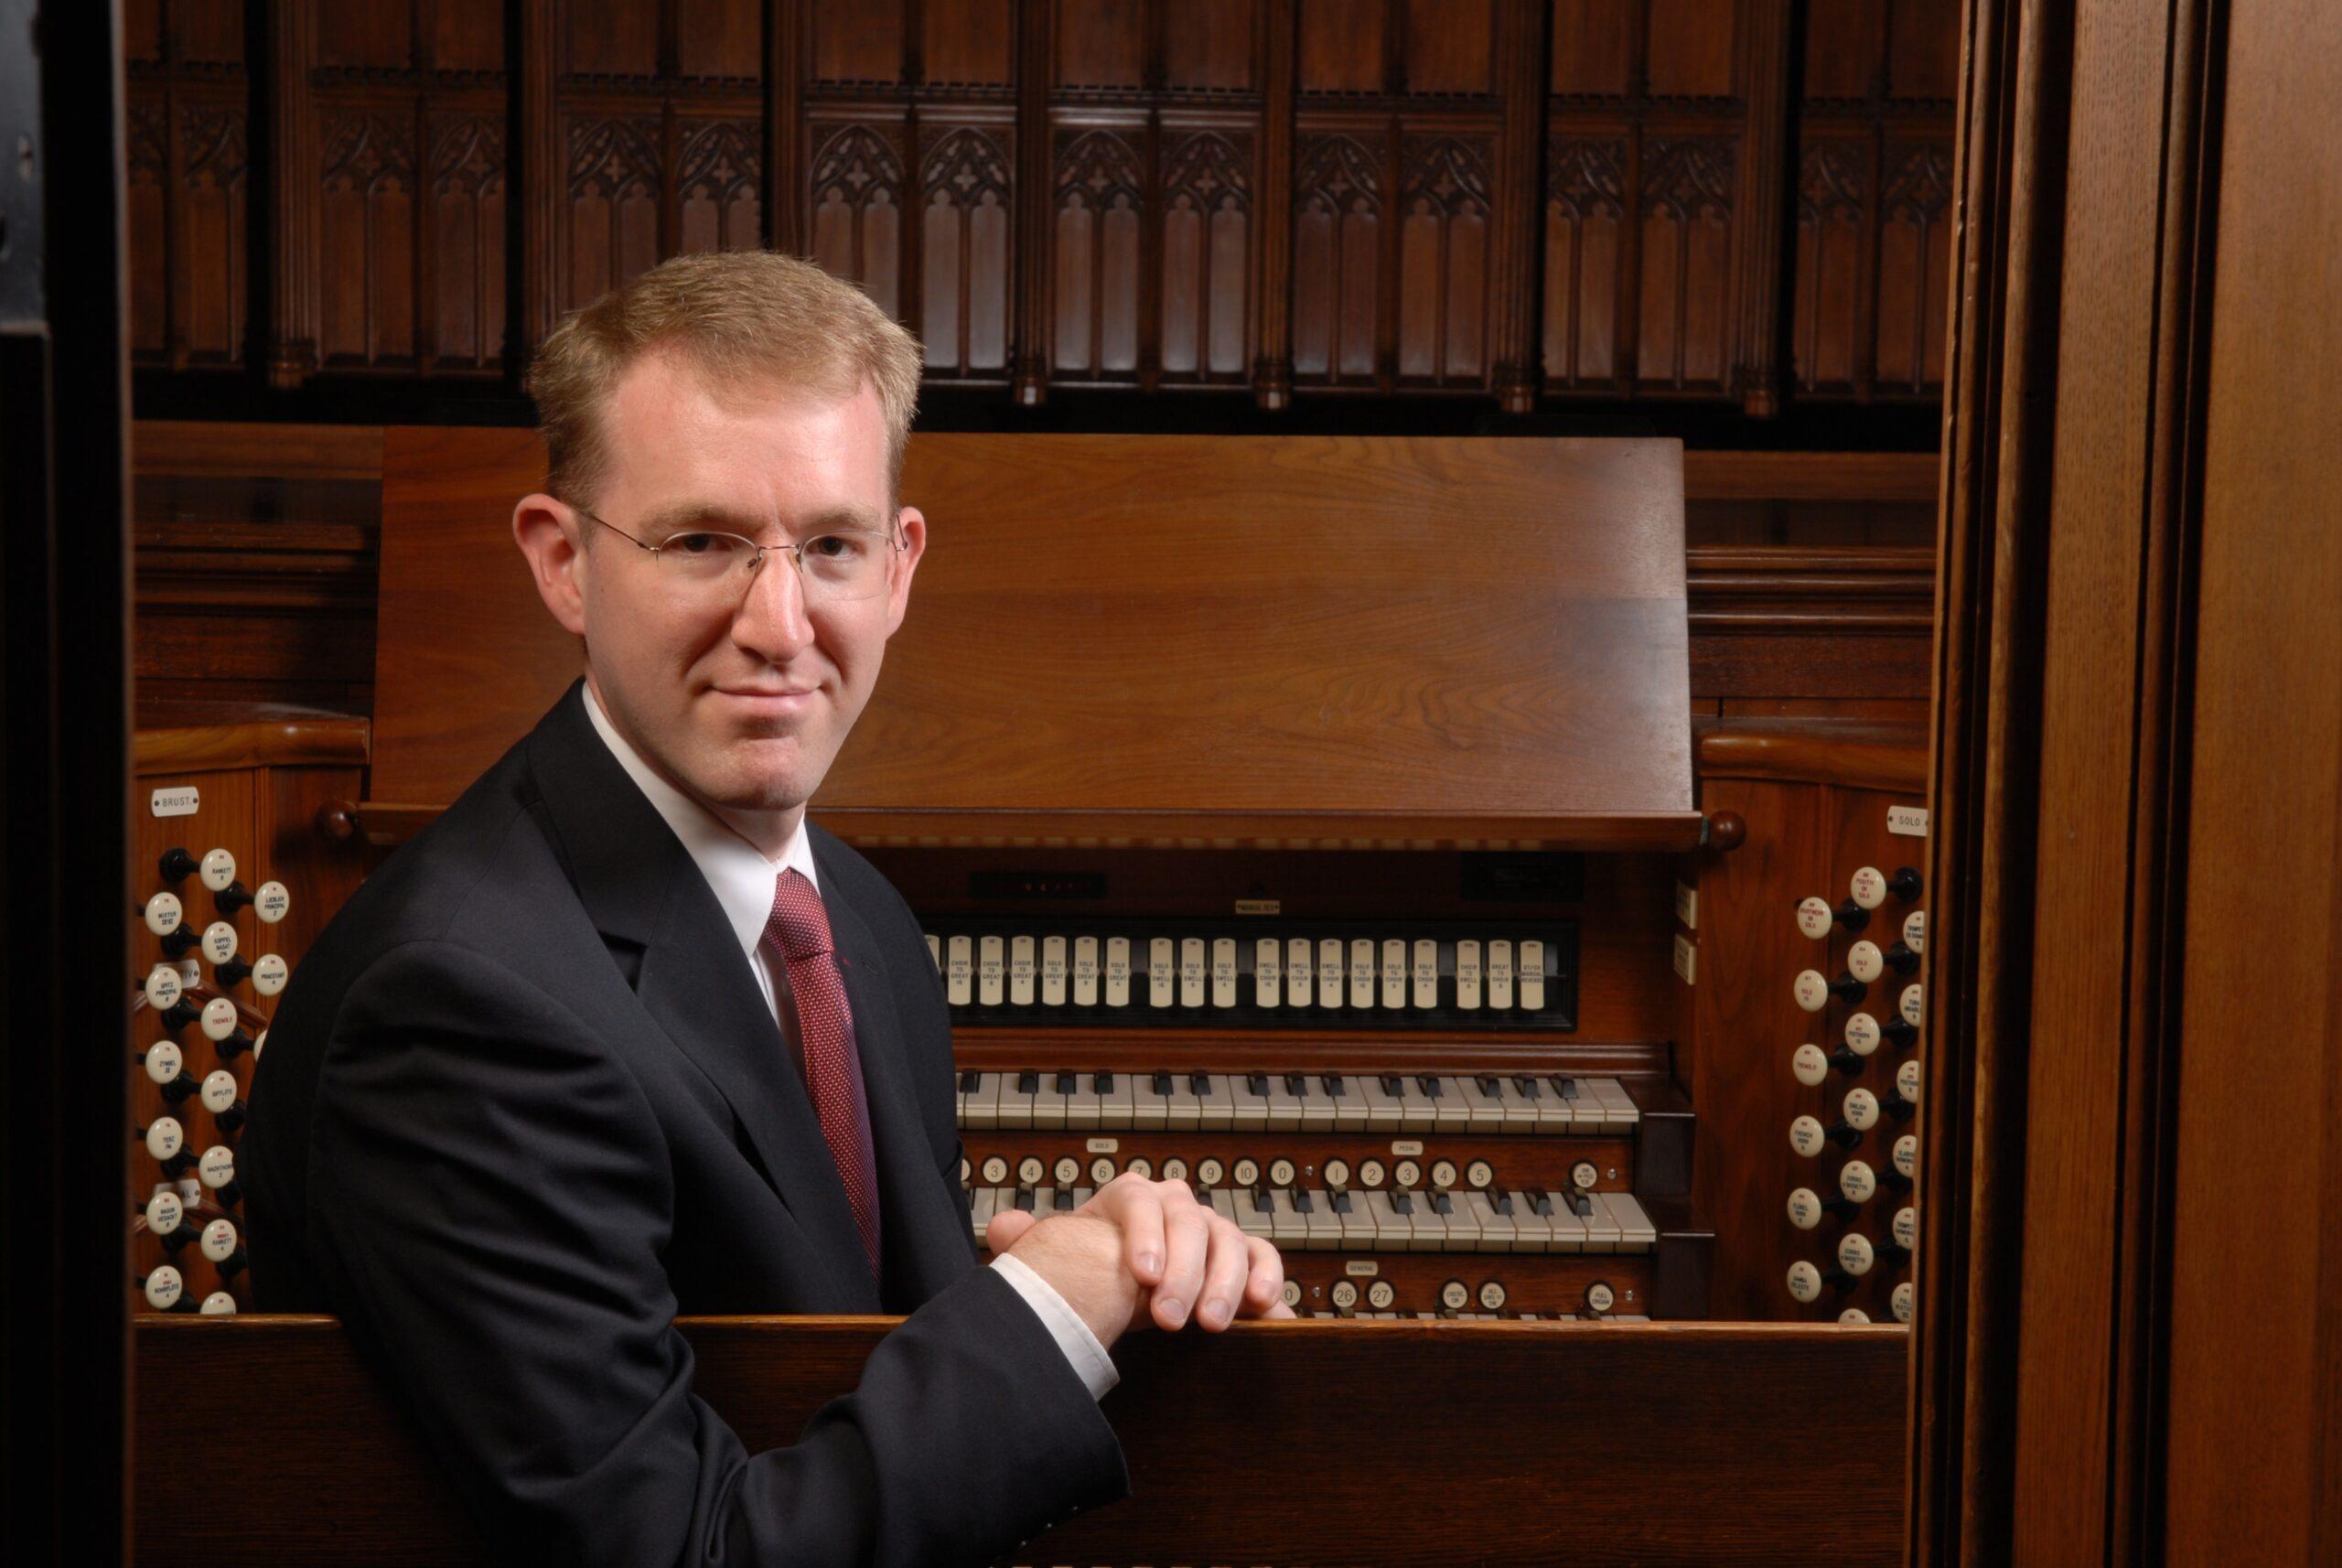 Organist Scott Dettra